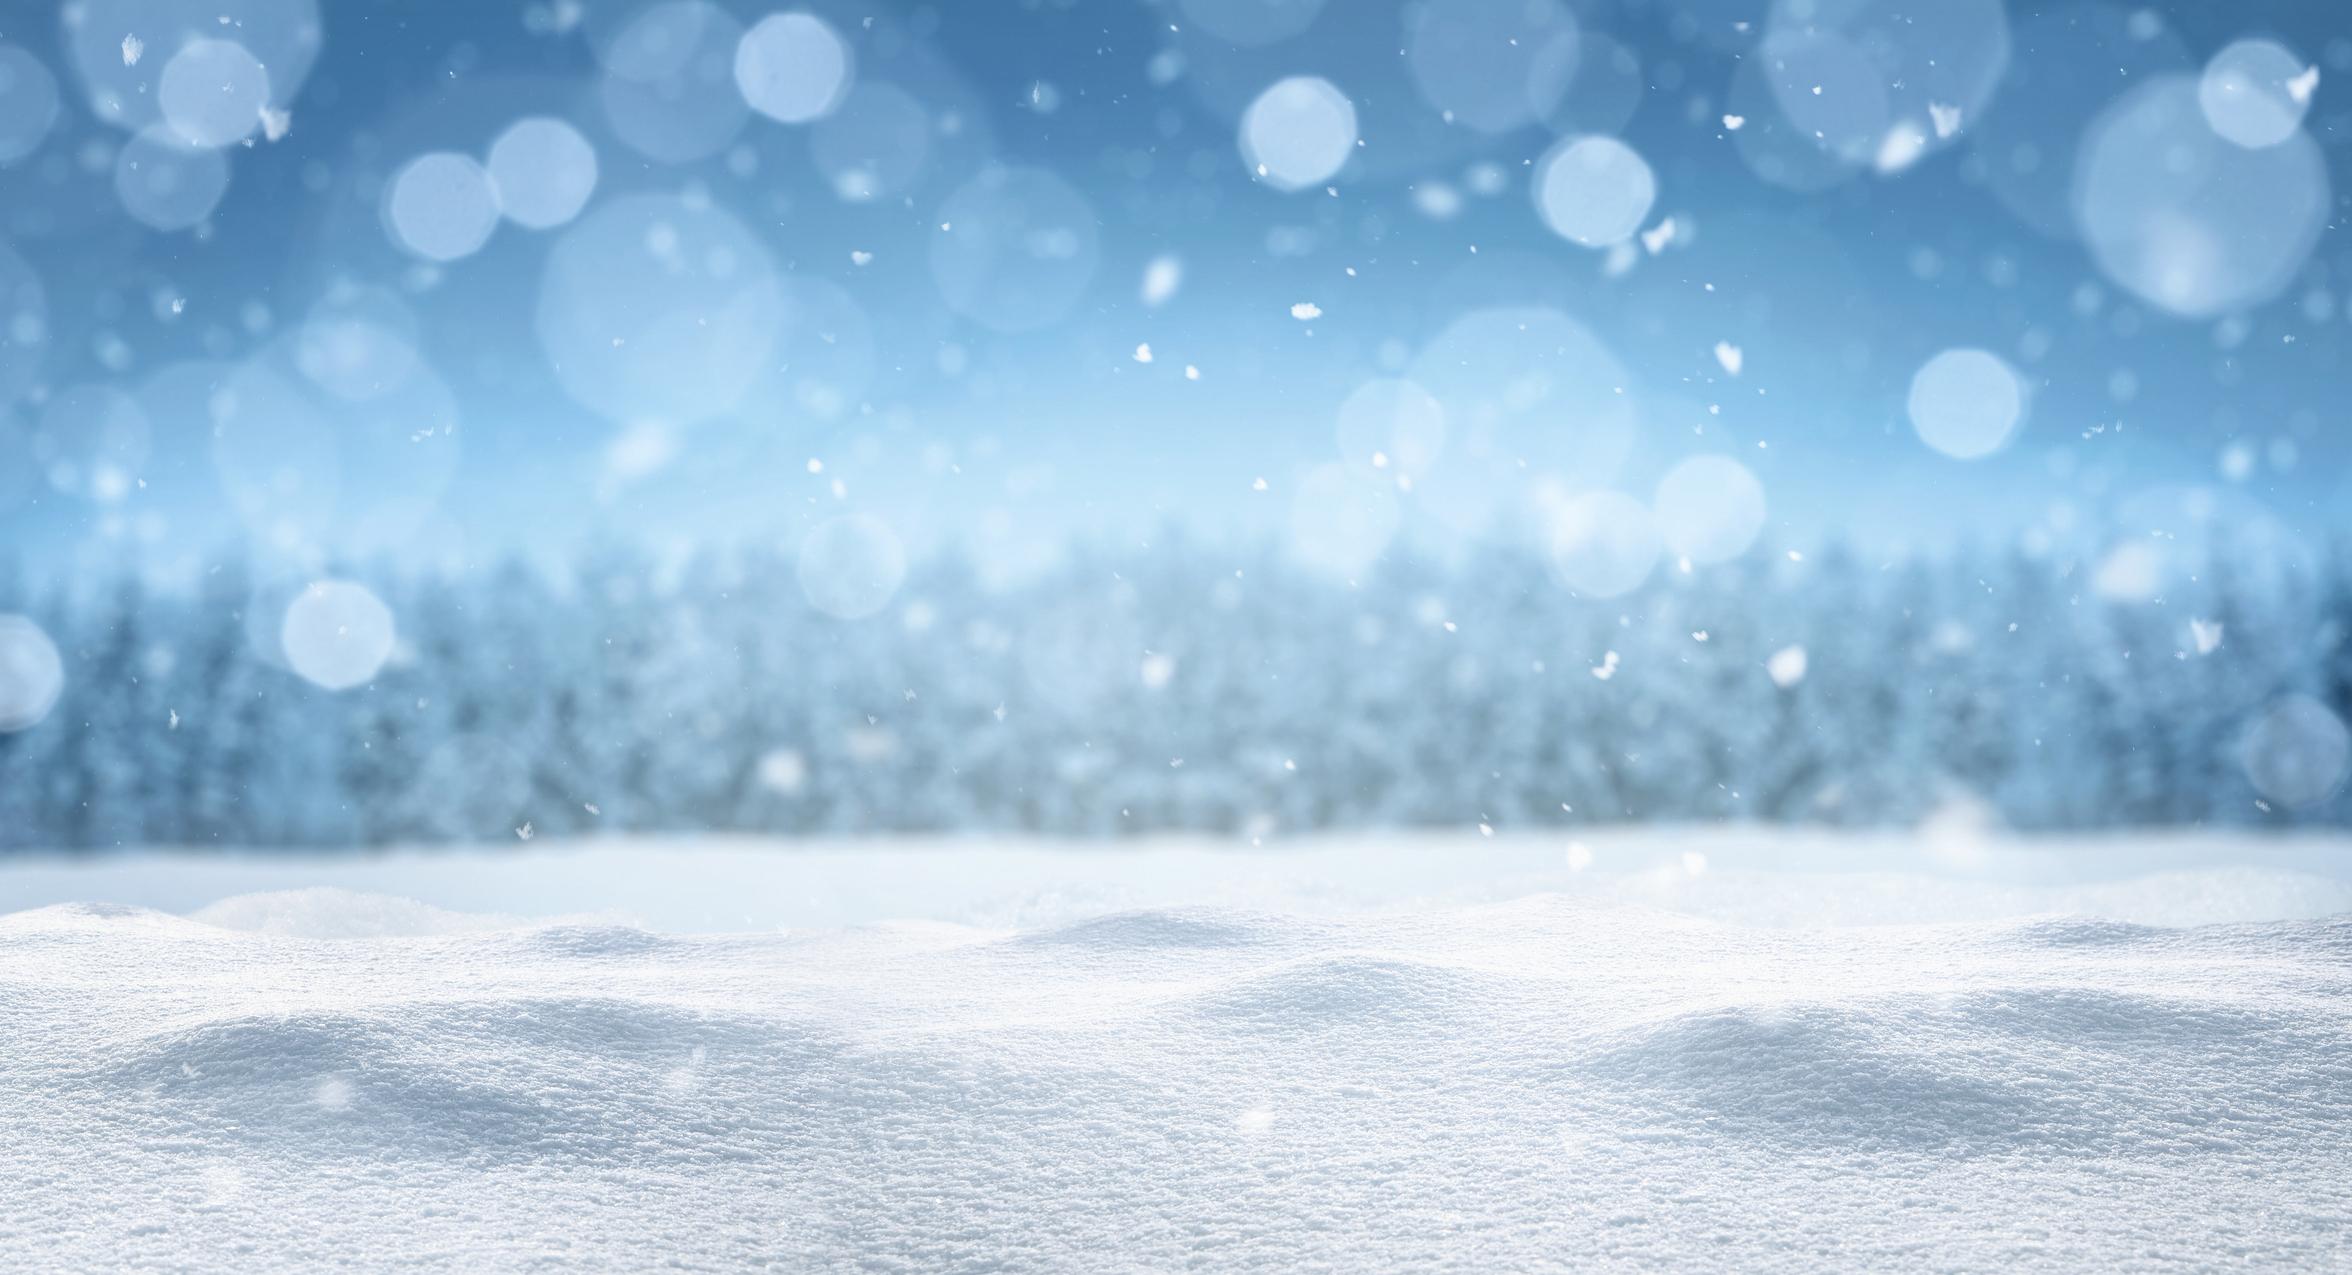 5 Reasons Investors Are Paying a Premium for Snowflake Danny Vena   Sep 24, 2020